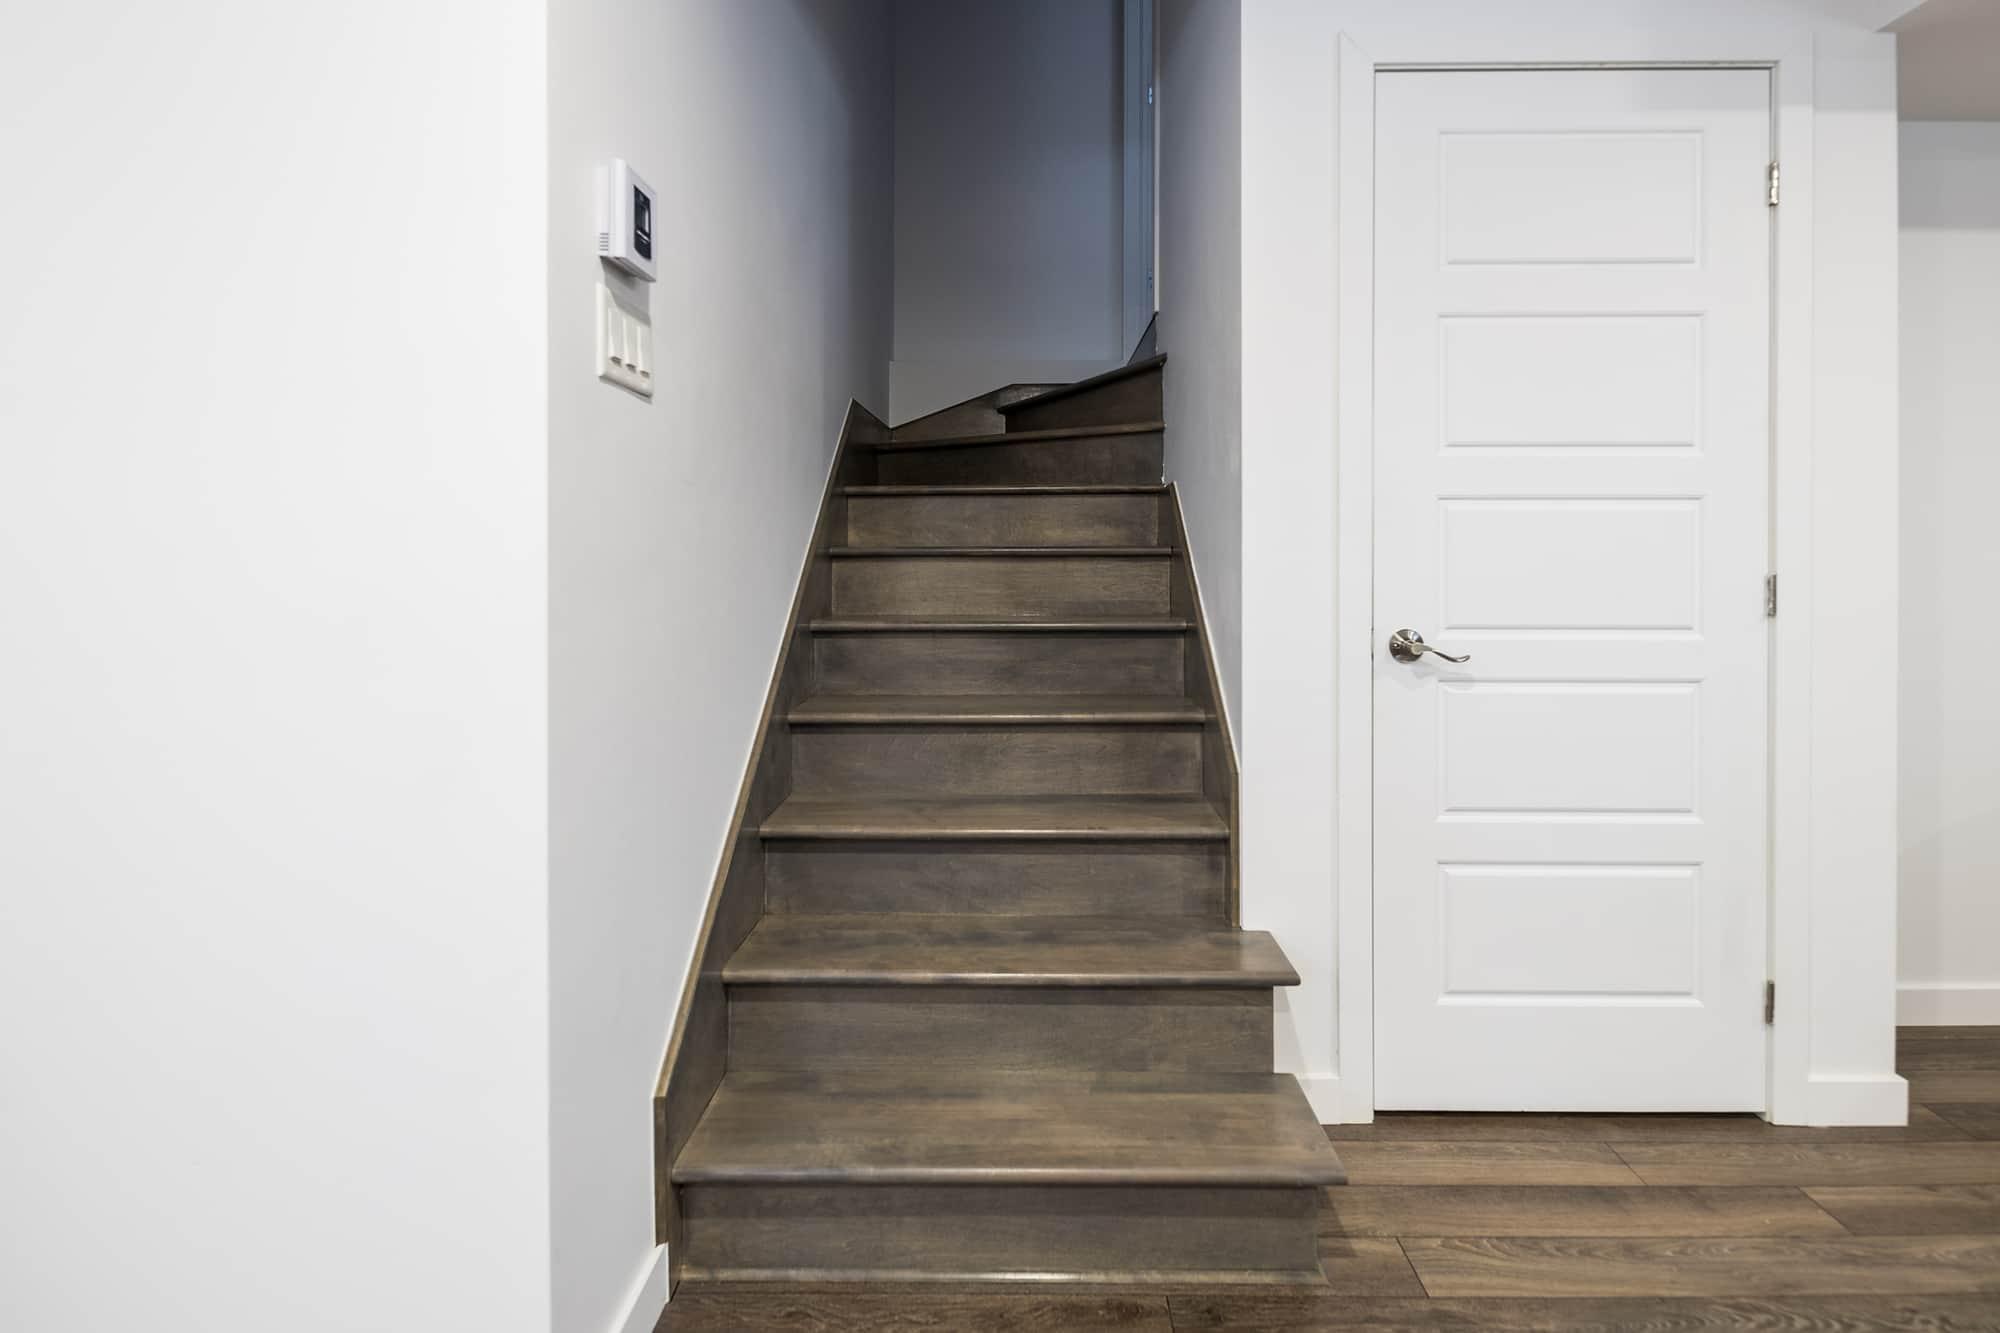 Stairway in a basement